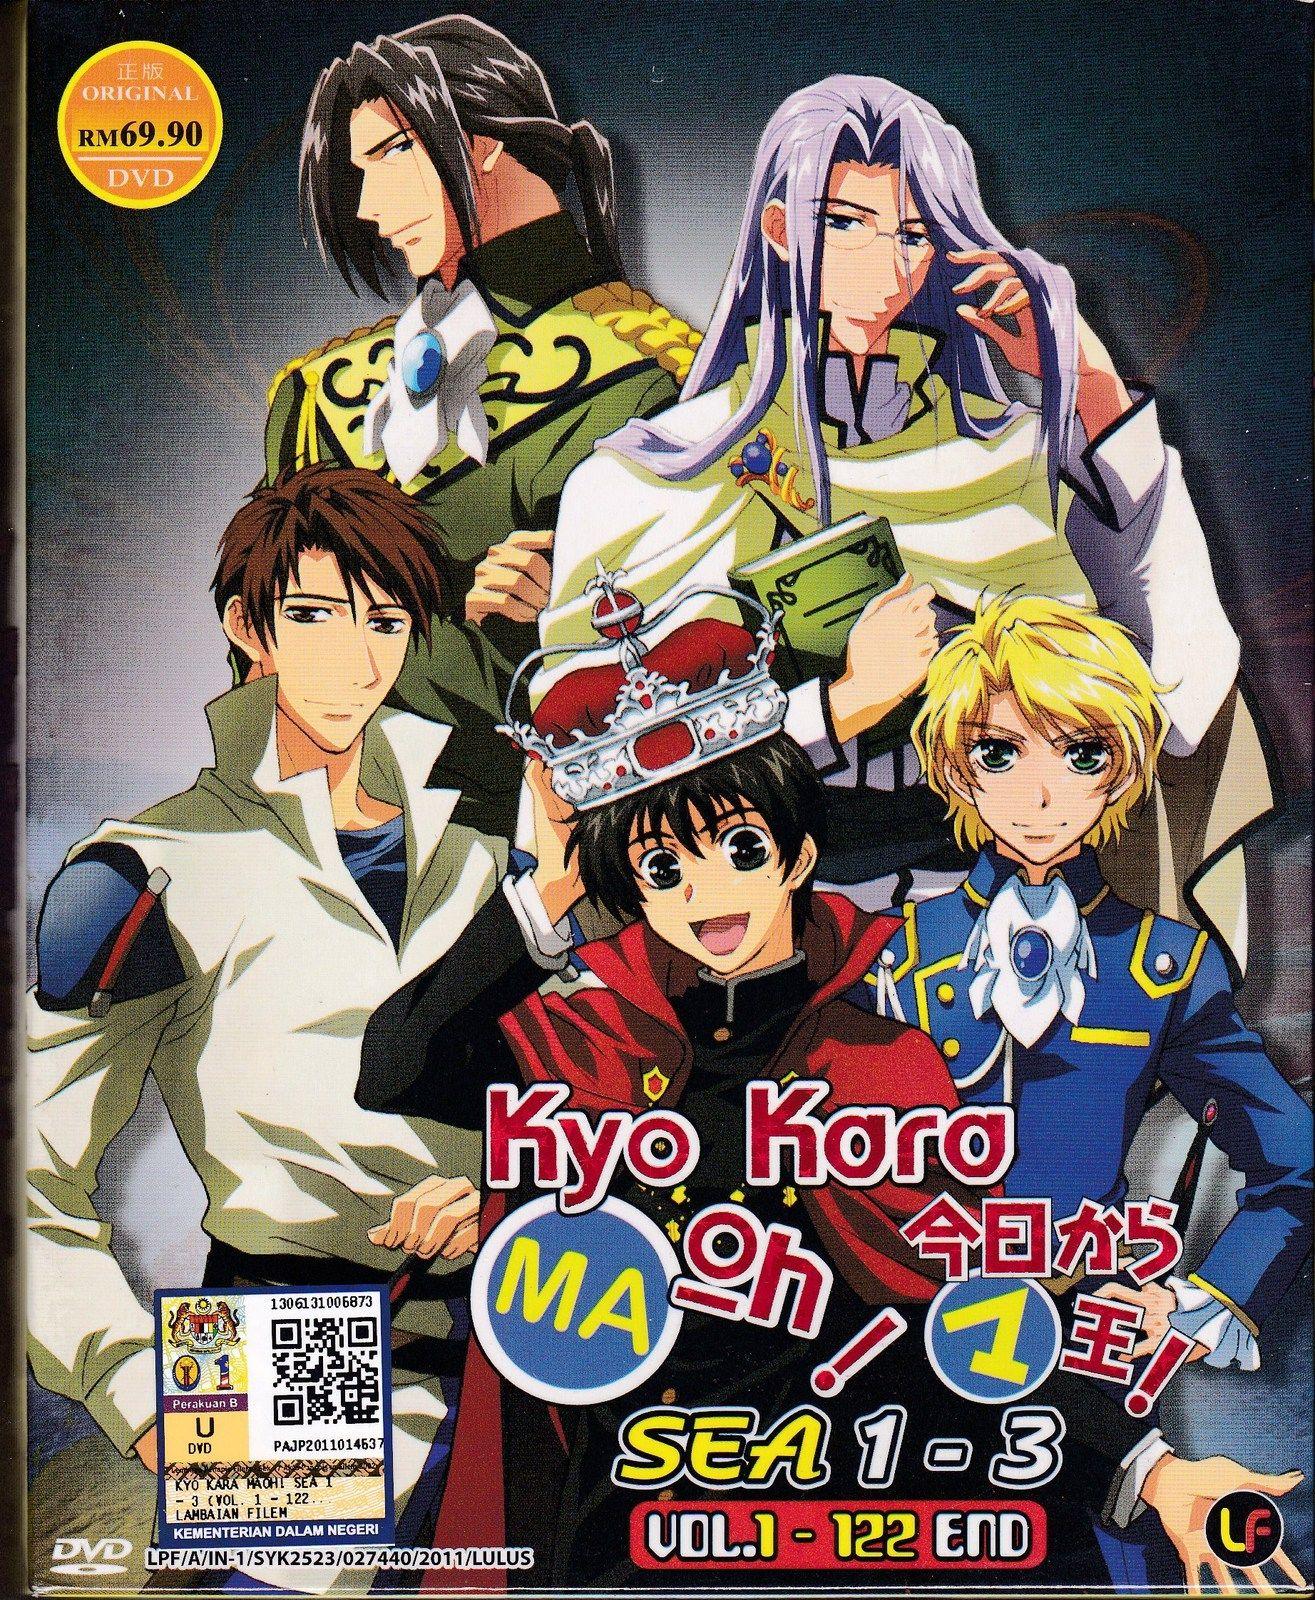 Dvd anime kyo kara maoh demon king season 13 vol1